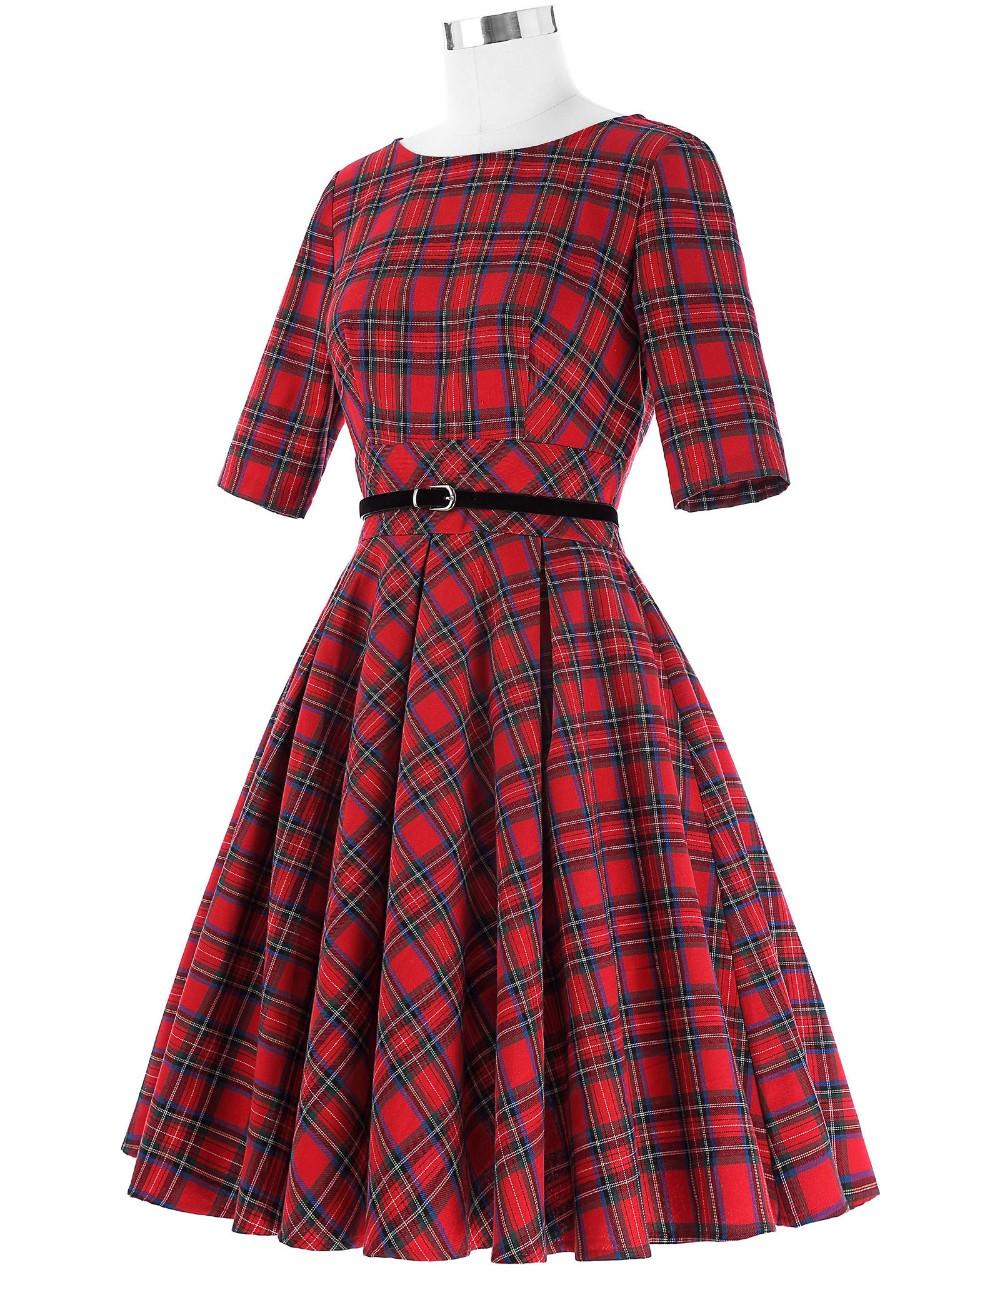 Womrobe soiree courte simple design cute dresses cheap jurken women office dresses  Vintage 50s Cotton Swing Casual dresses robe retro dress Ball Party ... 6bf3028e9